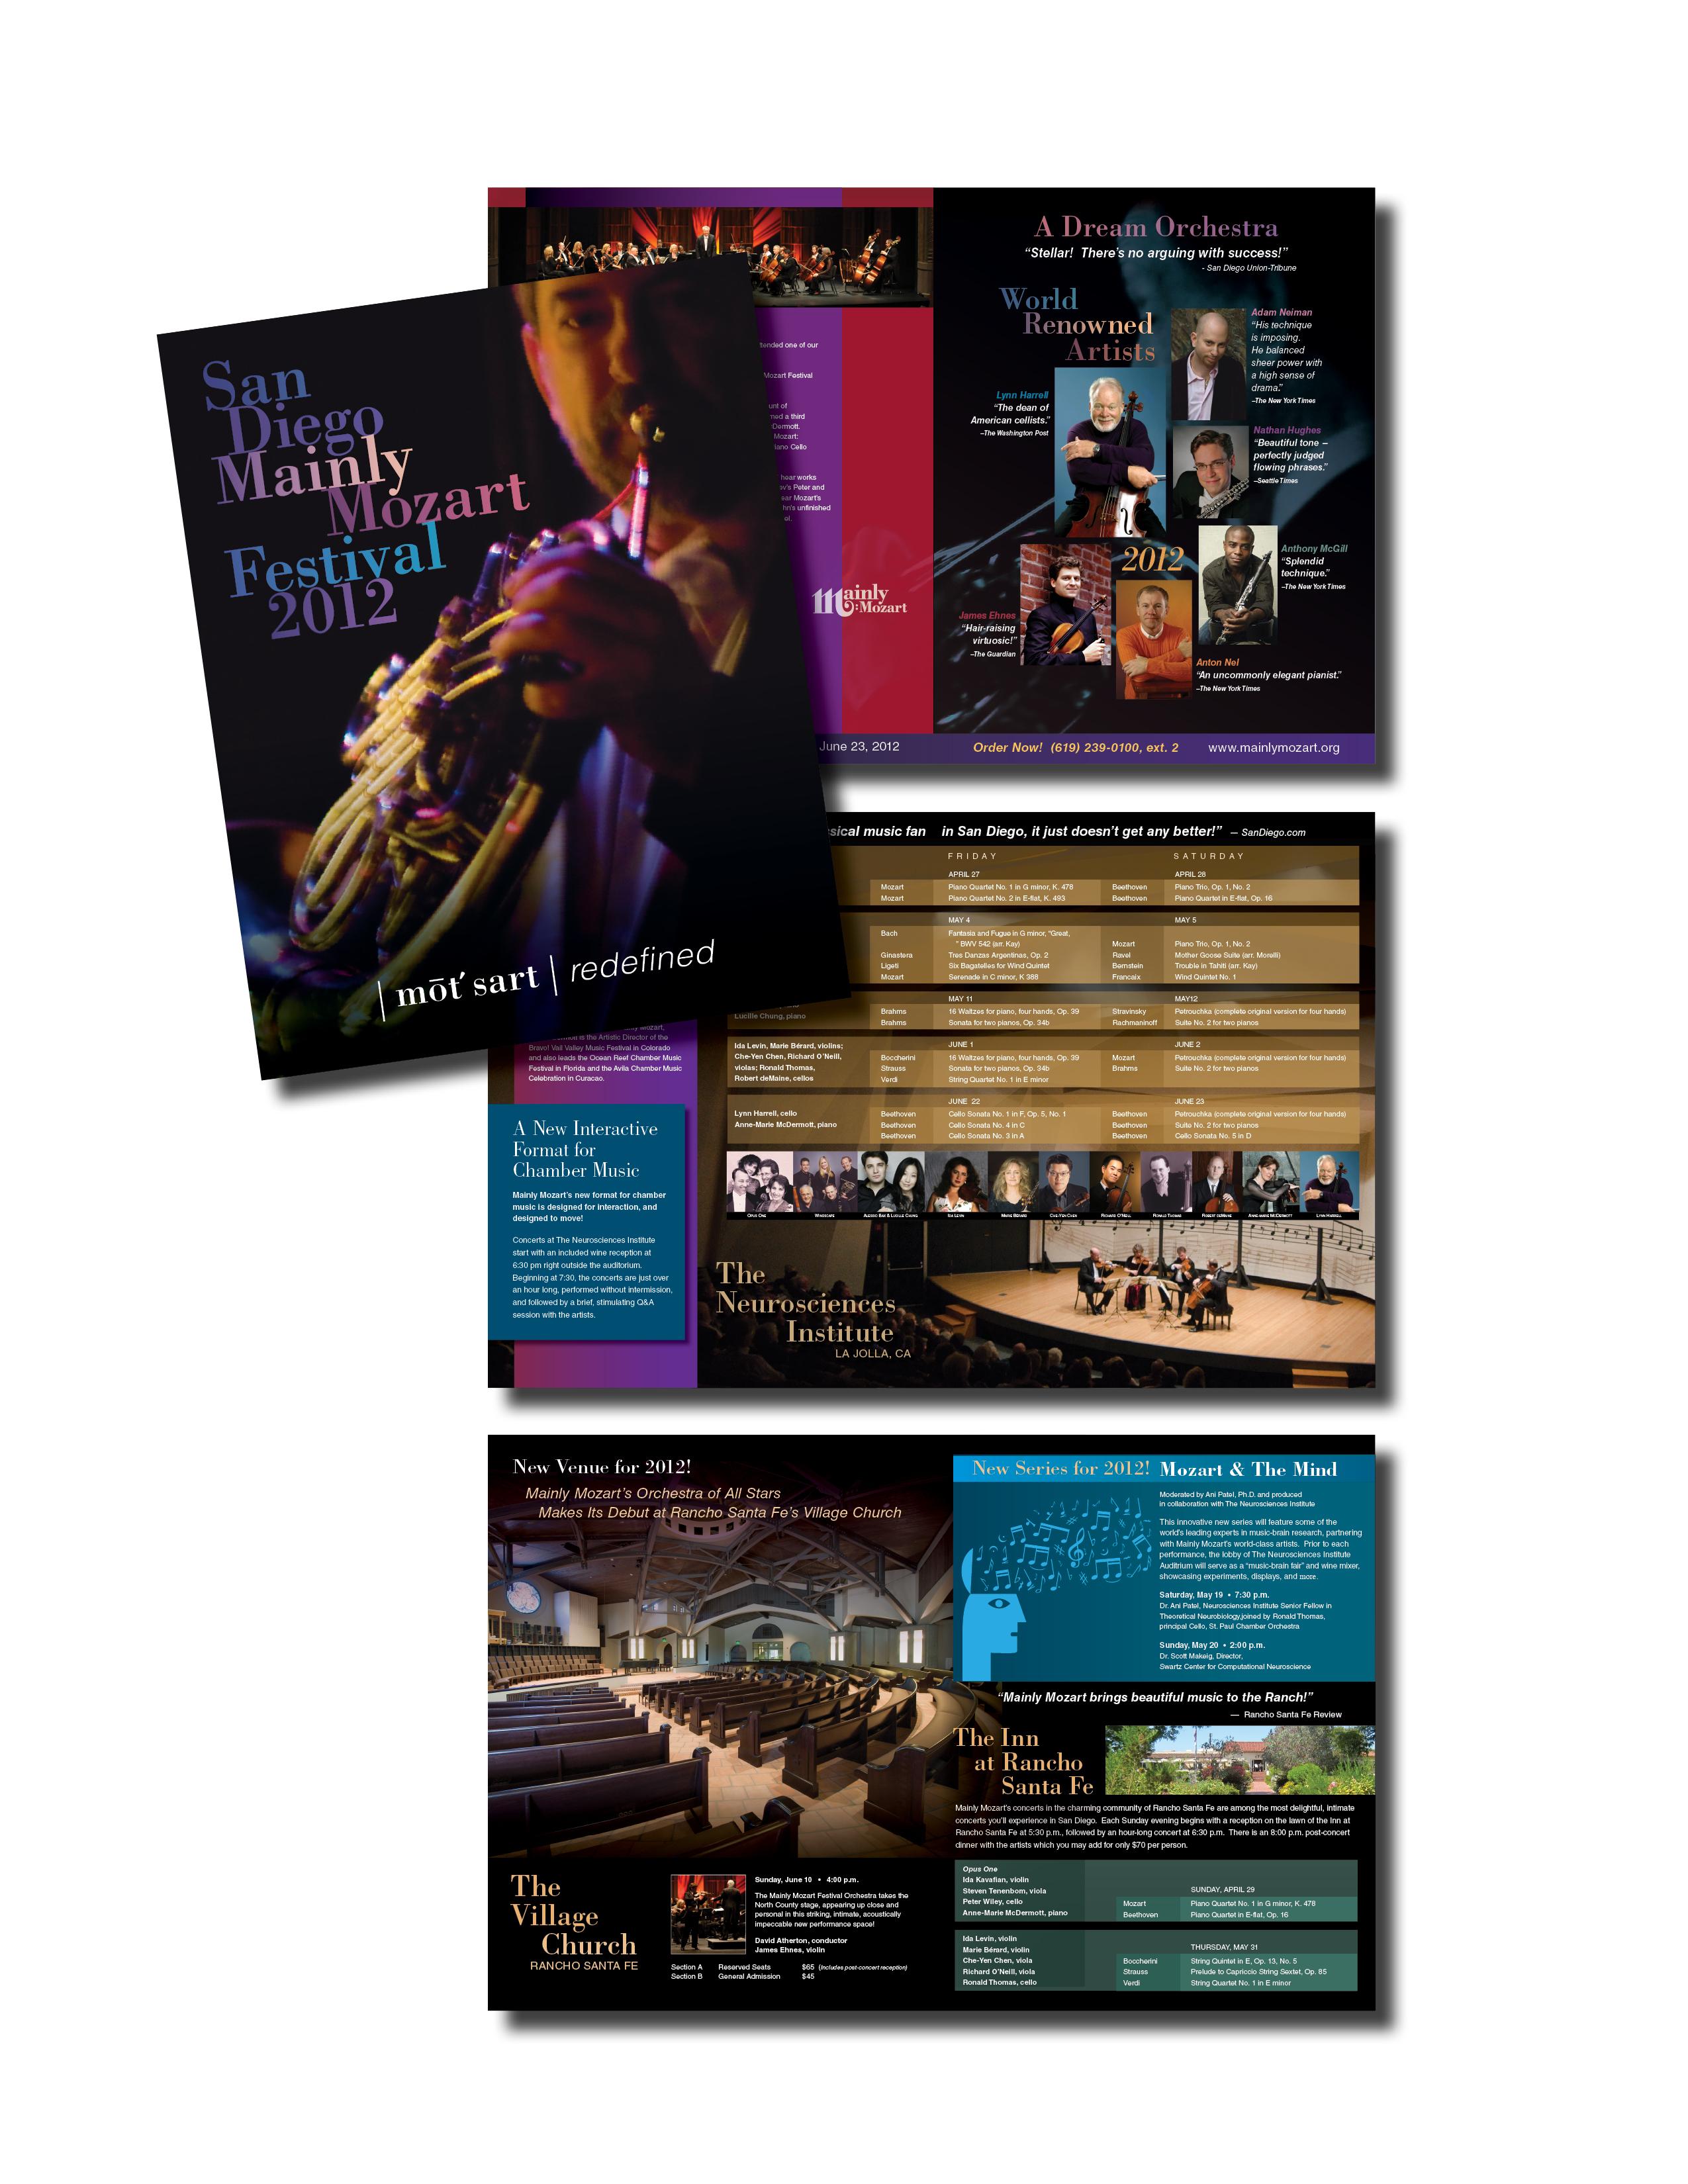 Mainly Mozart 2012 Festival Brochure